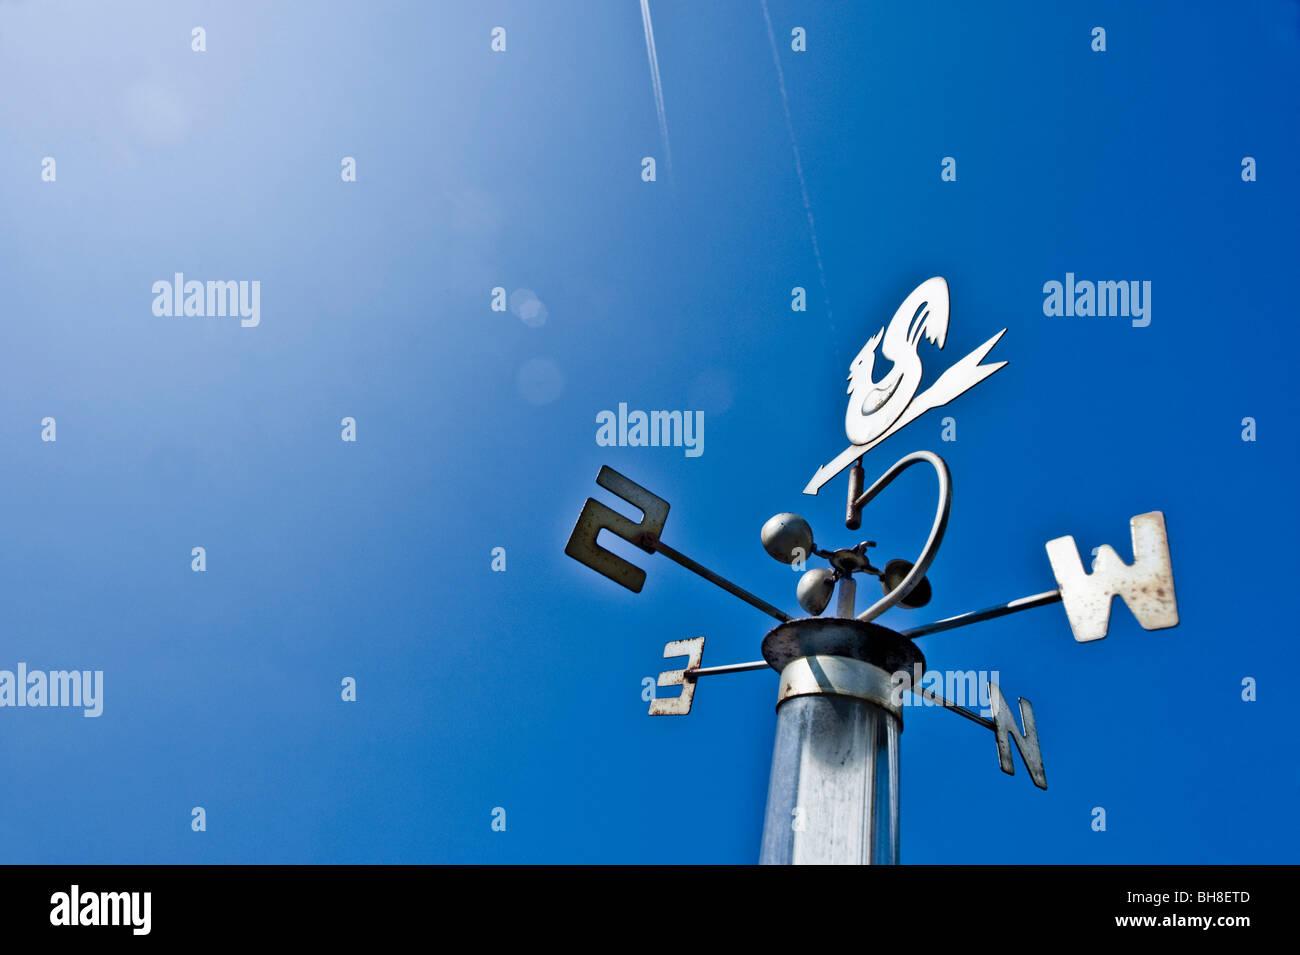 vane and compass - Stock Image